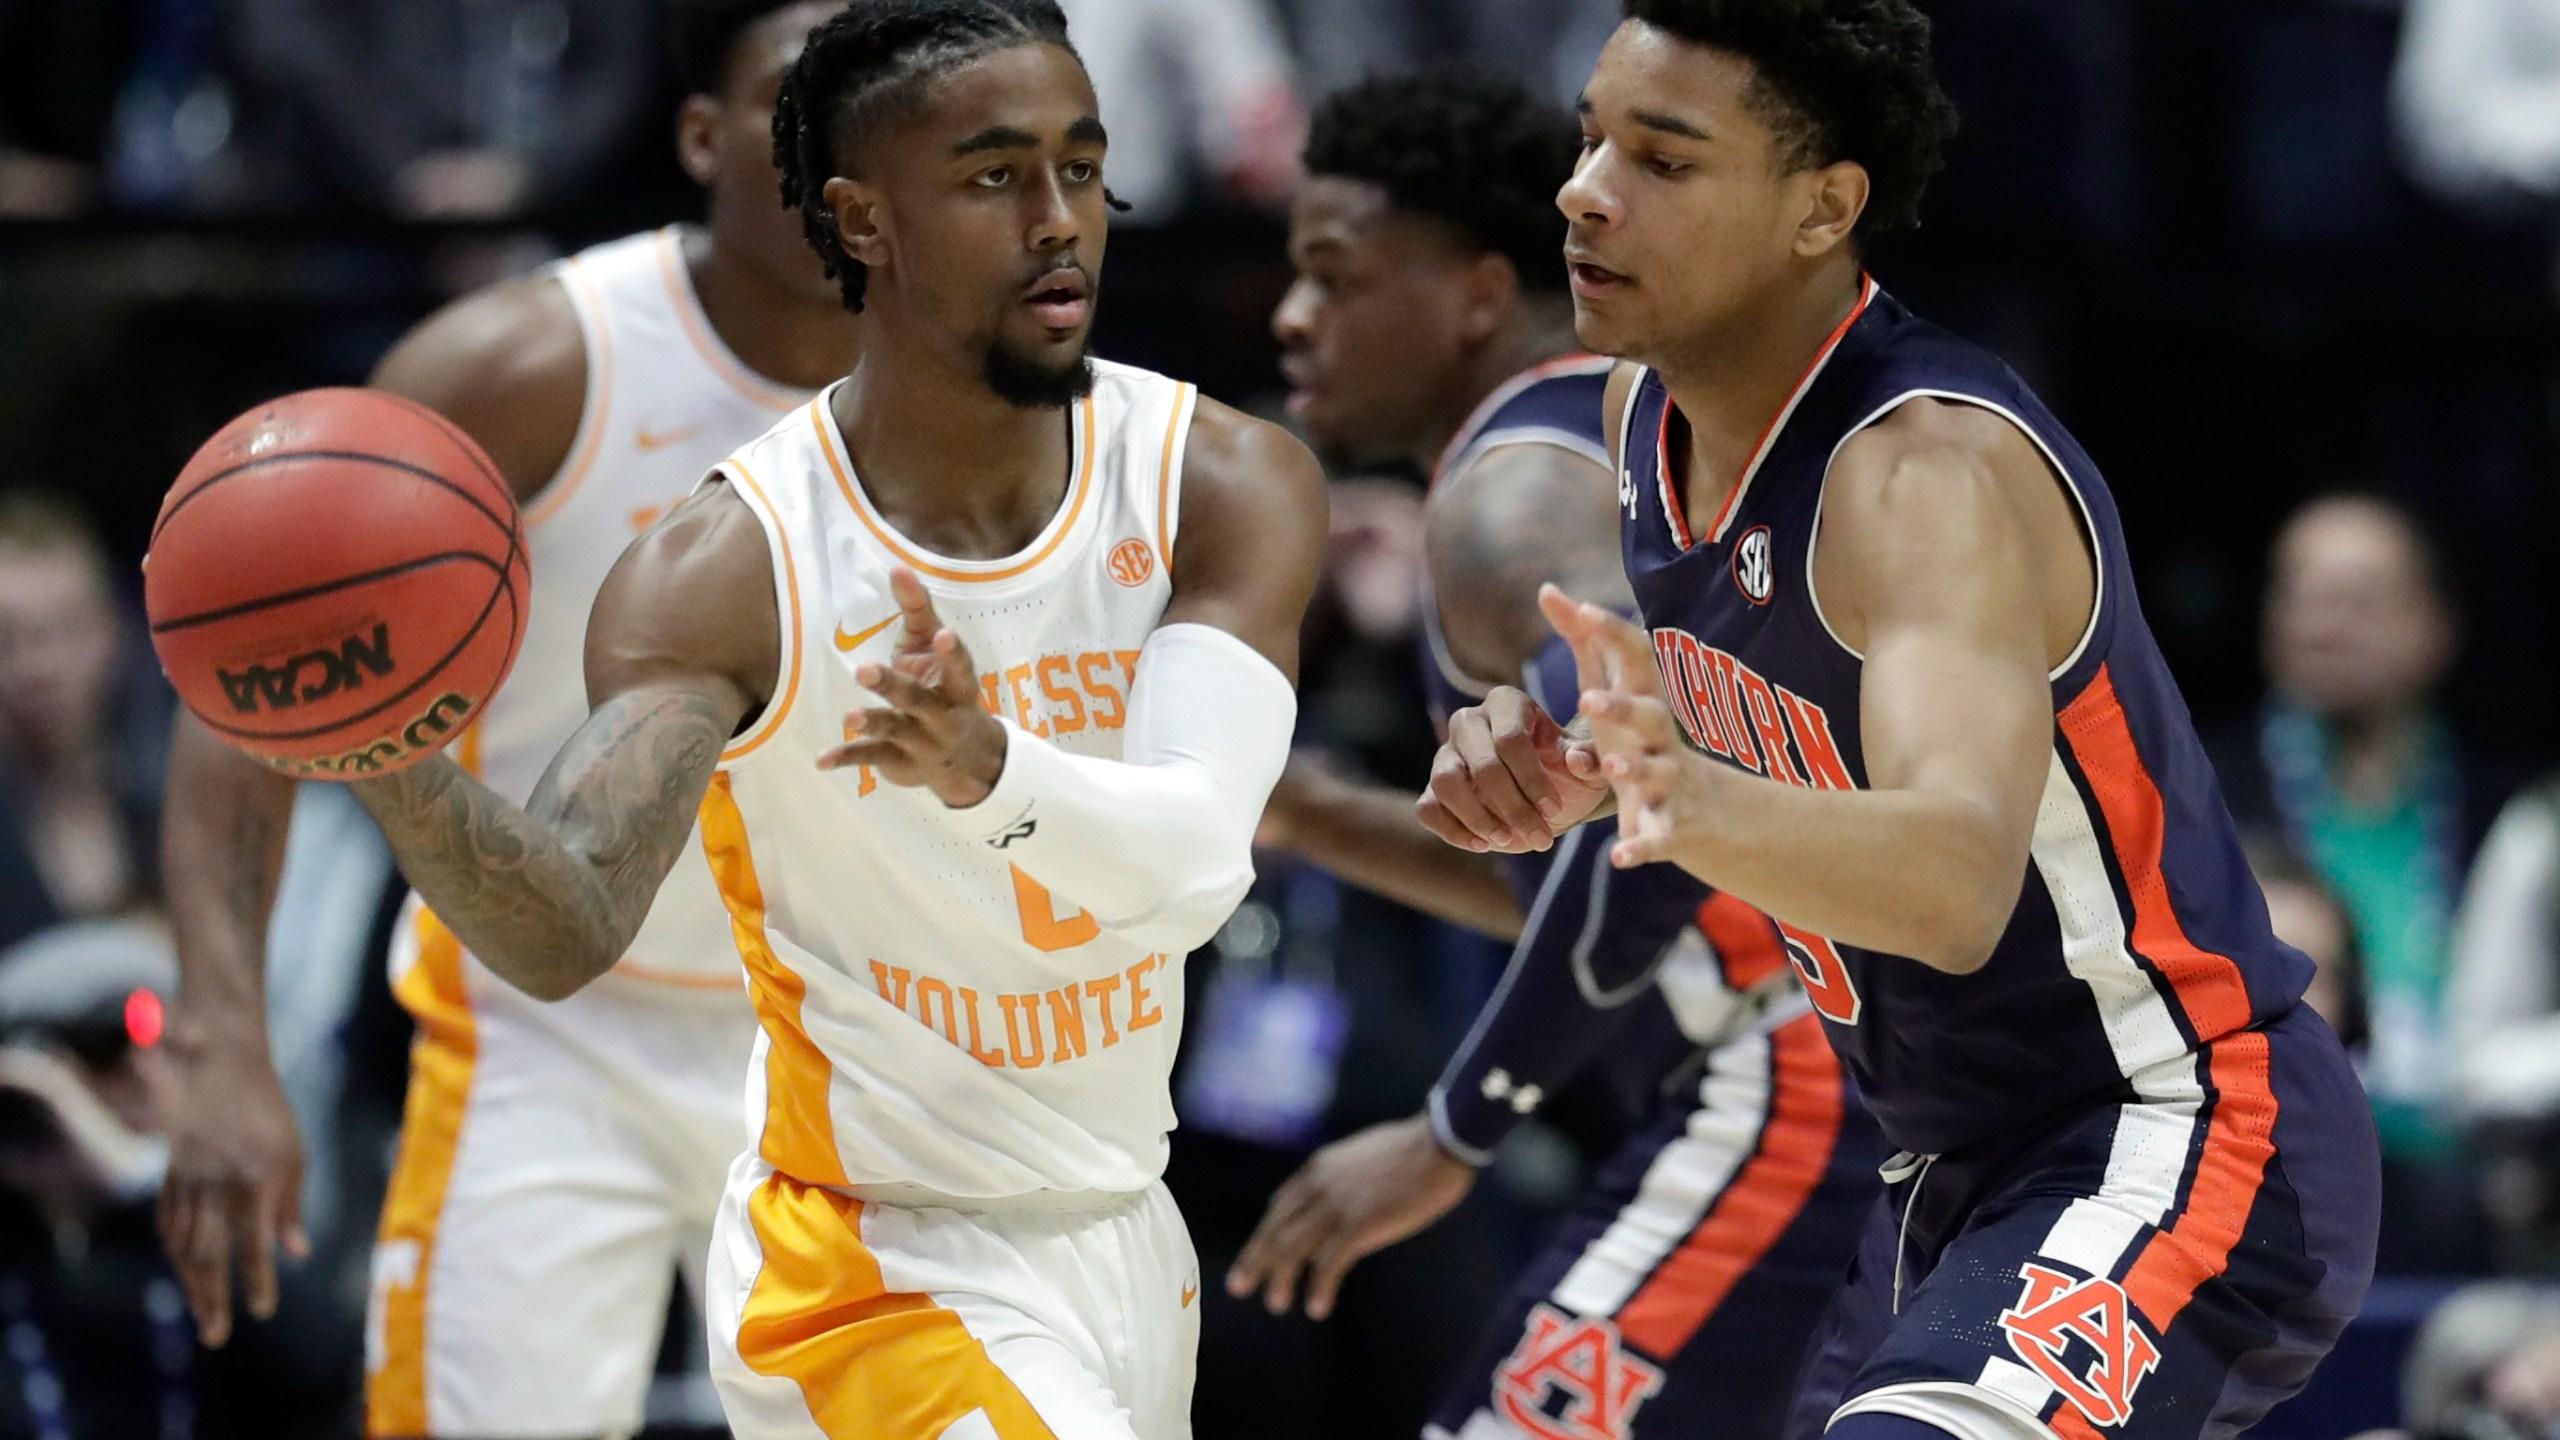 SEC Auburn Tennessee Basketball_1552843831983